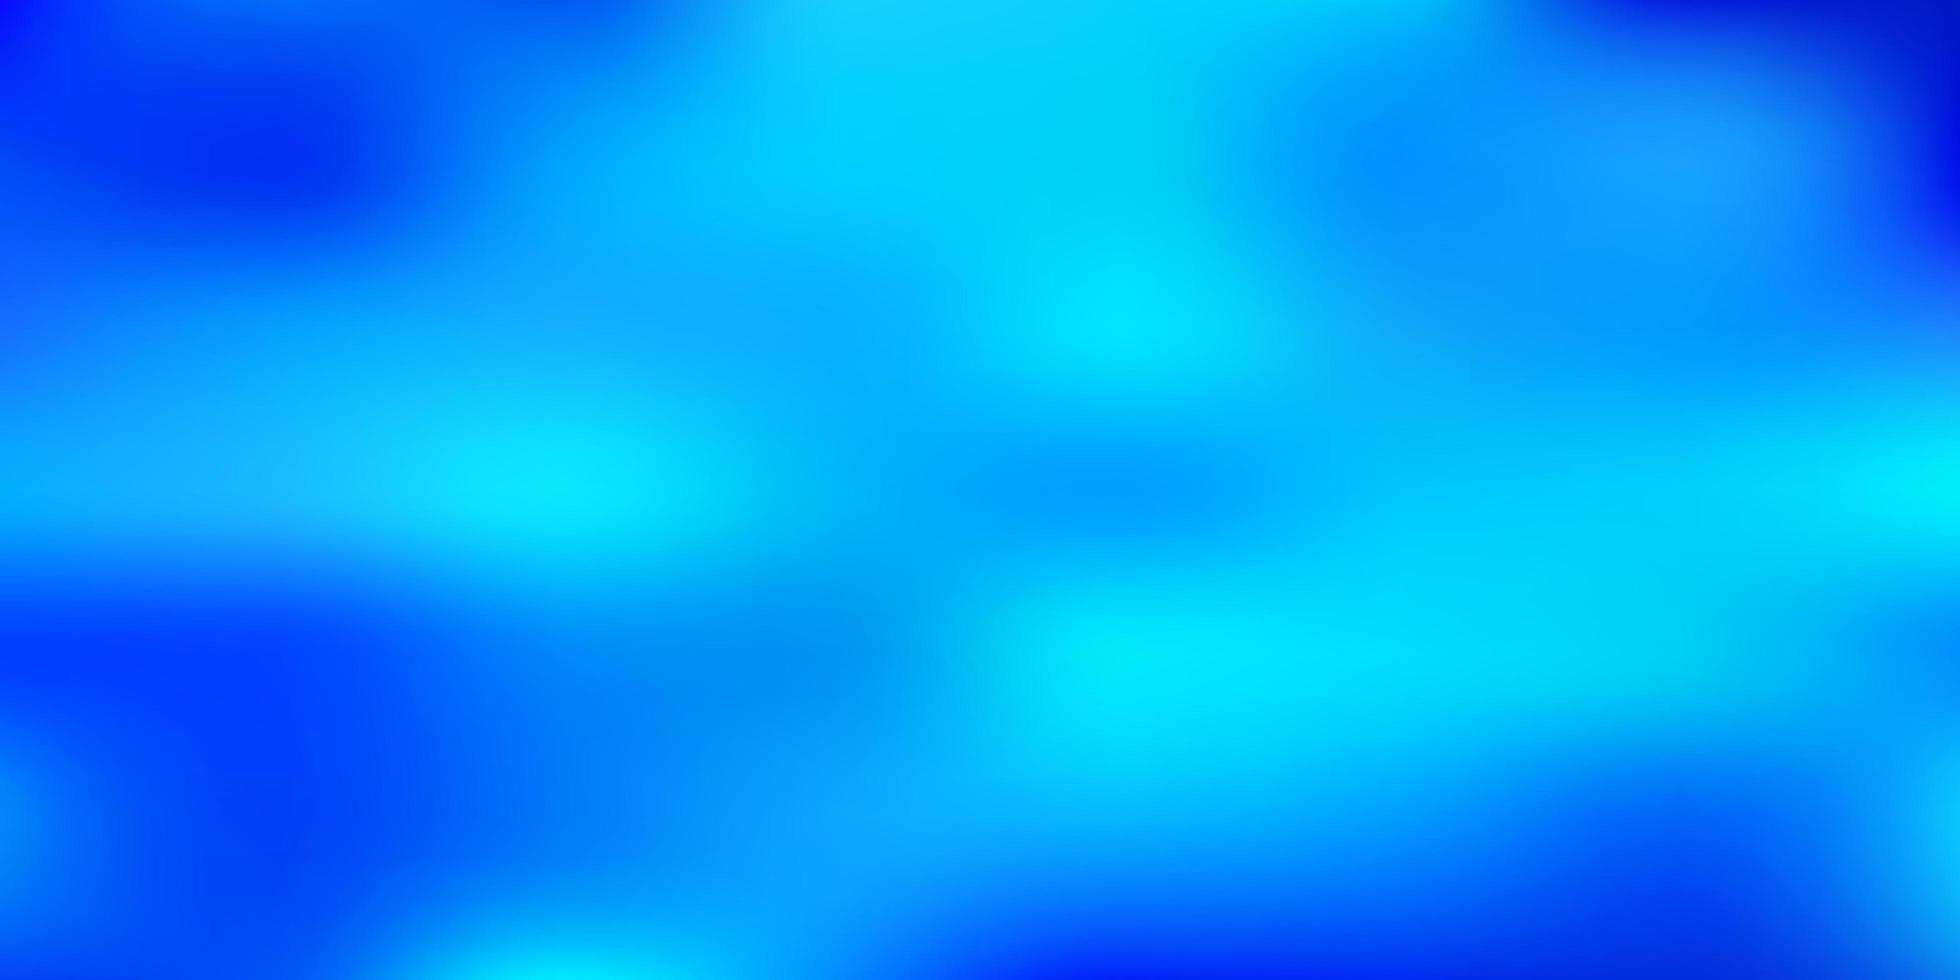 texture de flou de vecteur bleu clair.